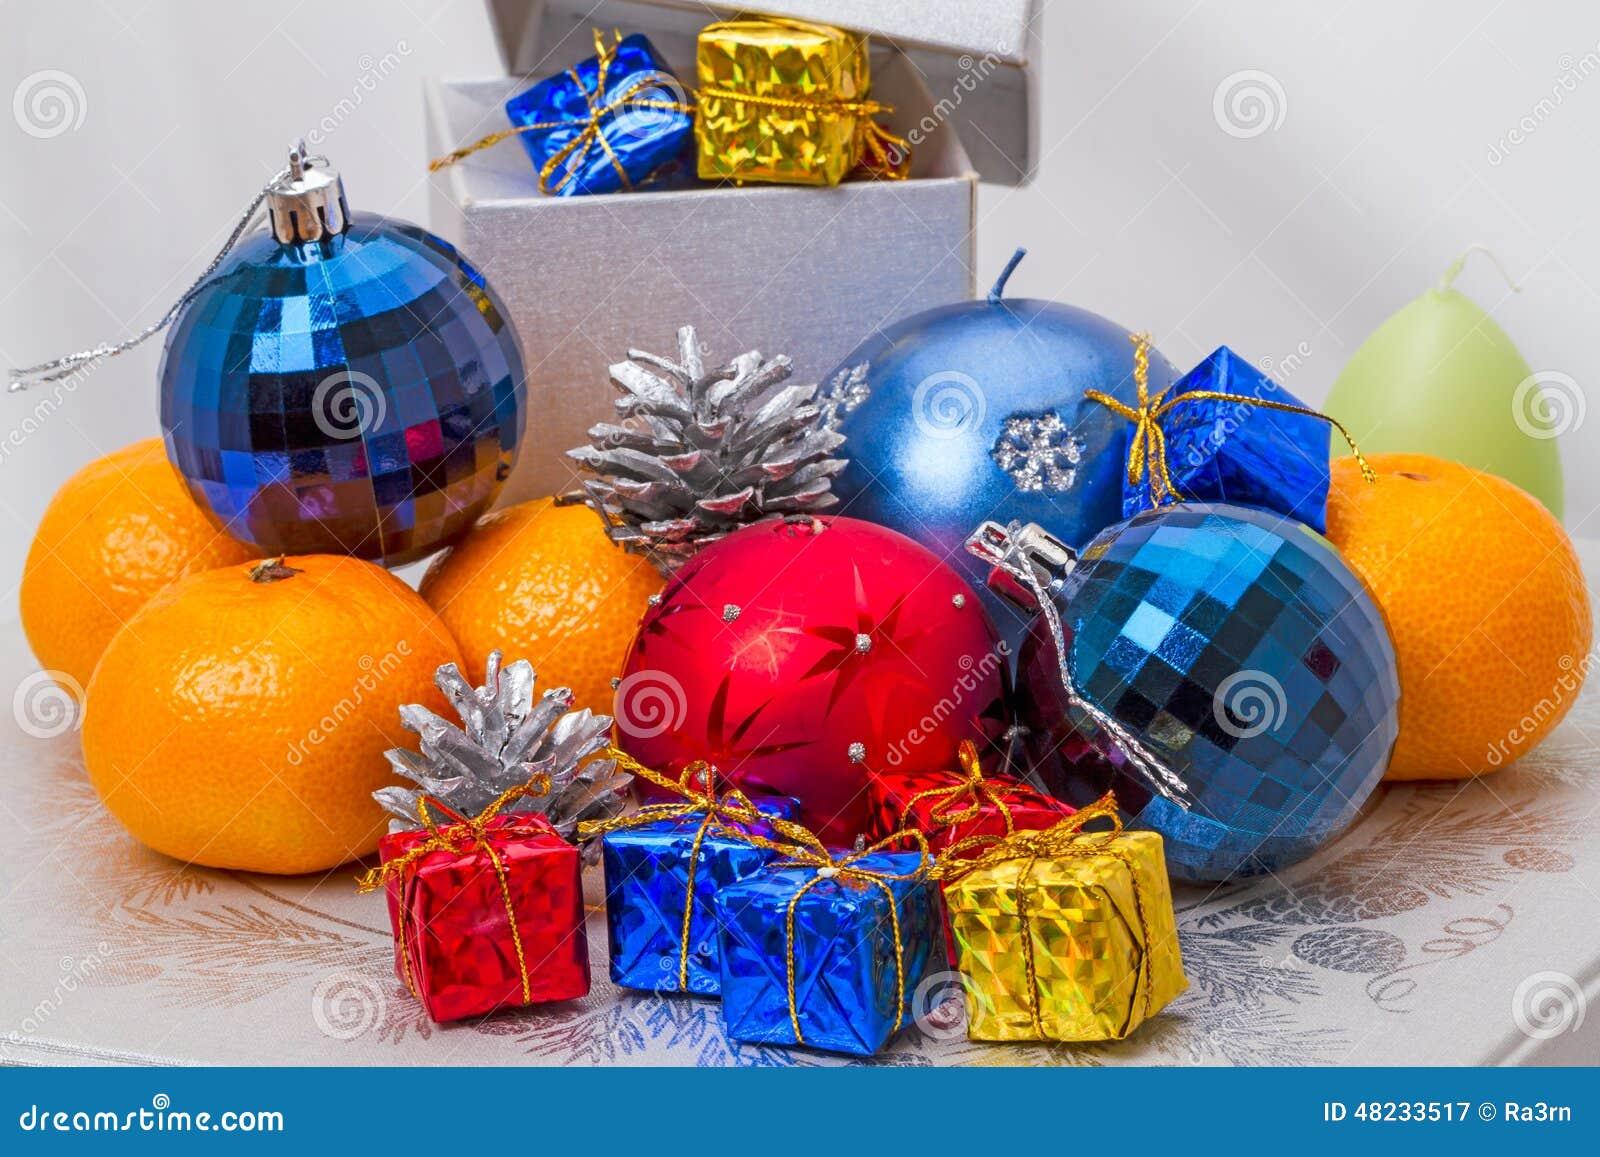 Pile Of Christmas Toys